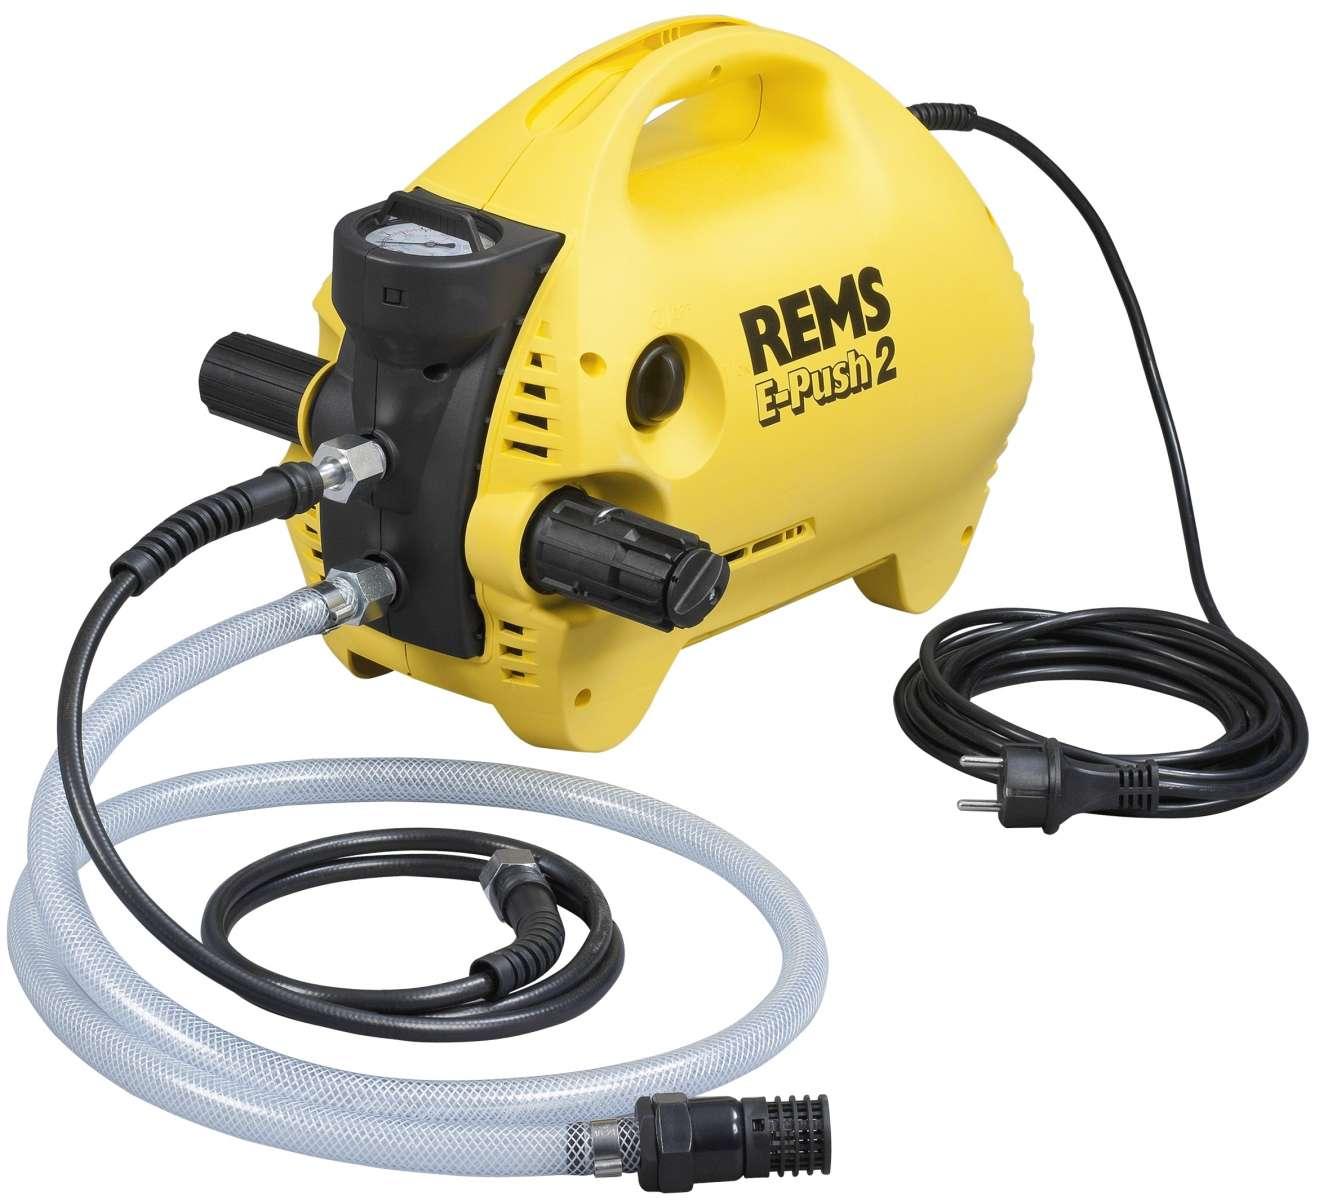 Rems E-Push test pompası( Su test pompası)